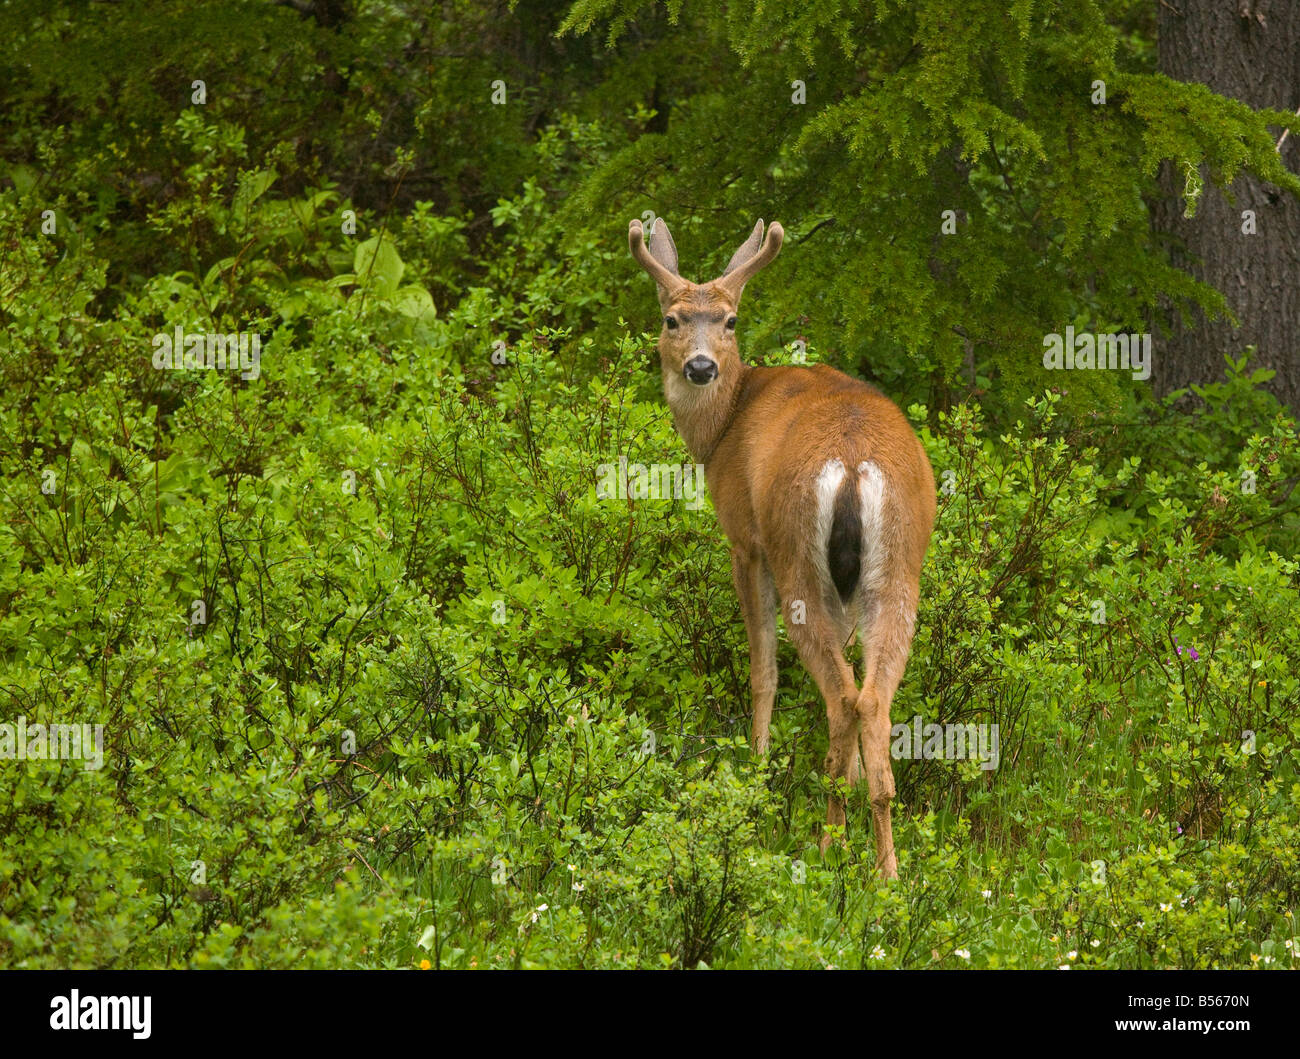 Black tailed deer or Blacktail deer Odocoileus hemionus in mountain forest Mount Rainier Washington - Stock Image